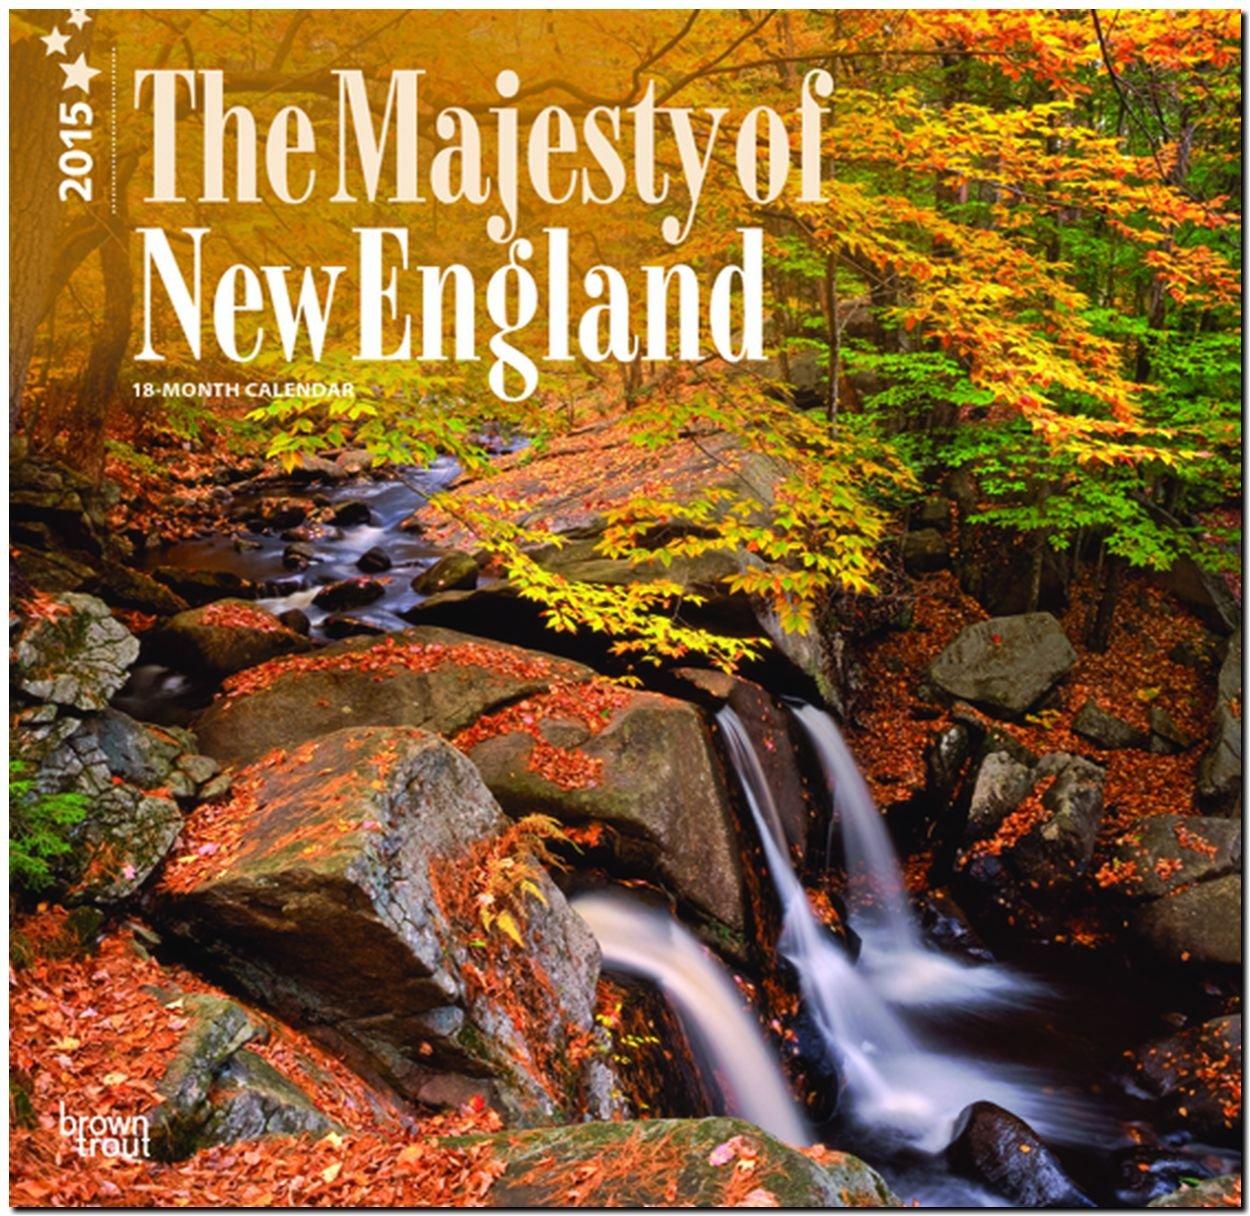 The Majesty of New England 2015 - Neuengland: Original BrownTrout-Kalender [Mehrsprachig] [Kalender]